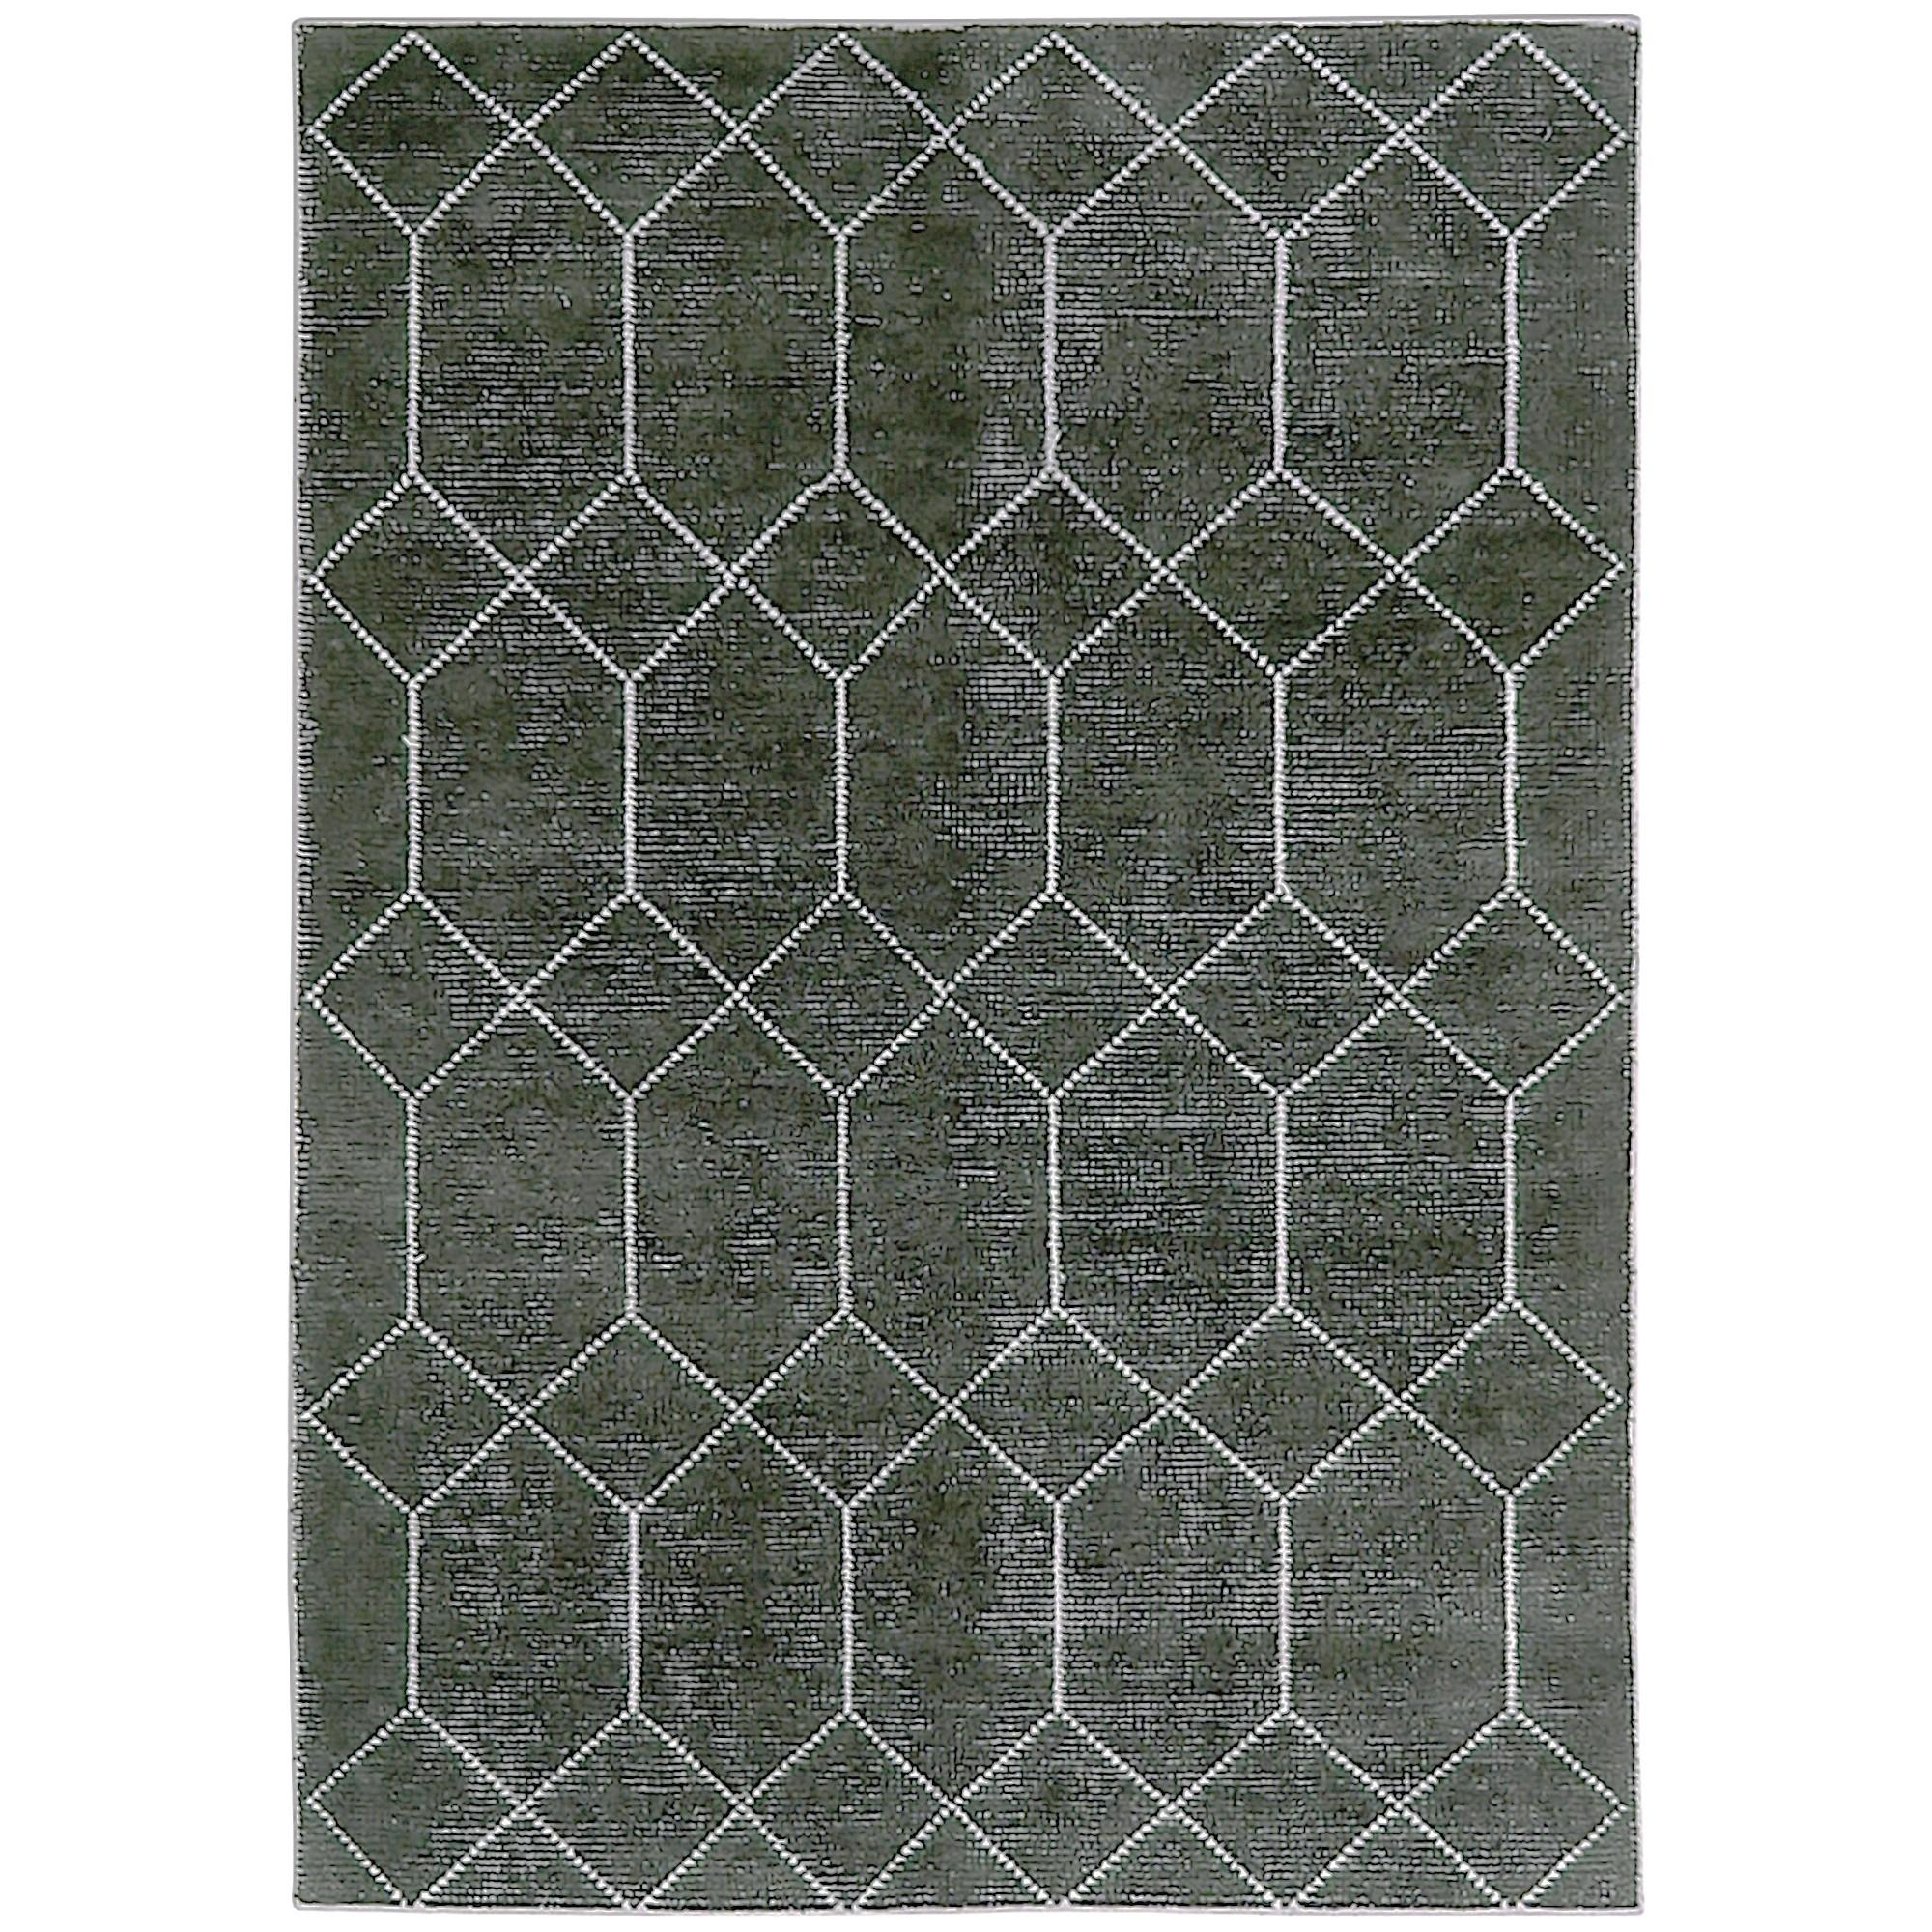 Geometrics Hand Knotted Wool Rug, 350x450cm, Black